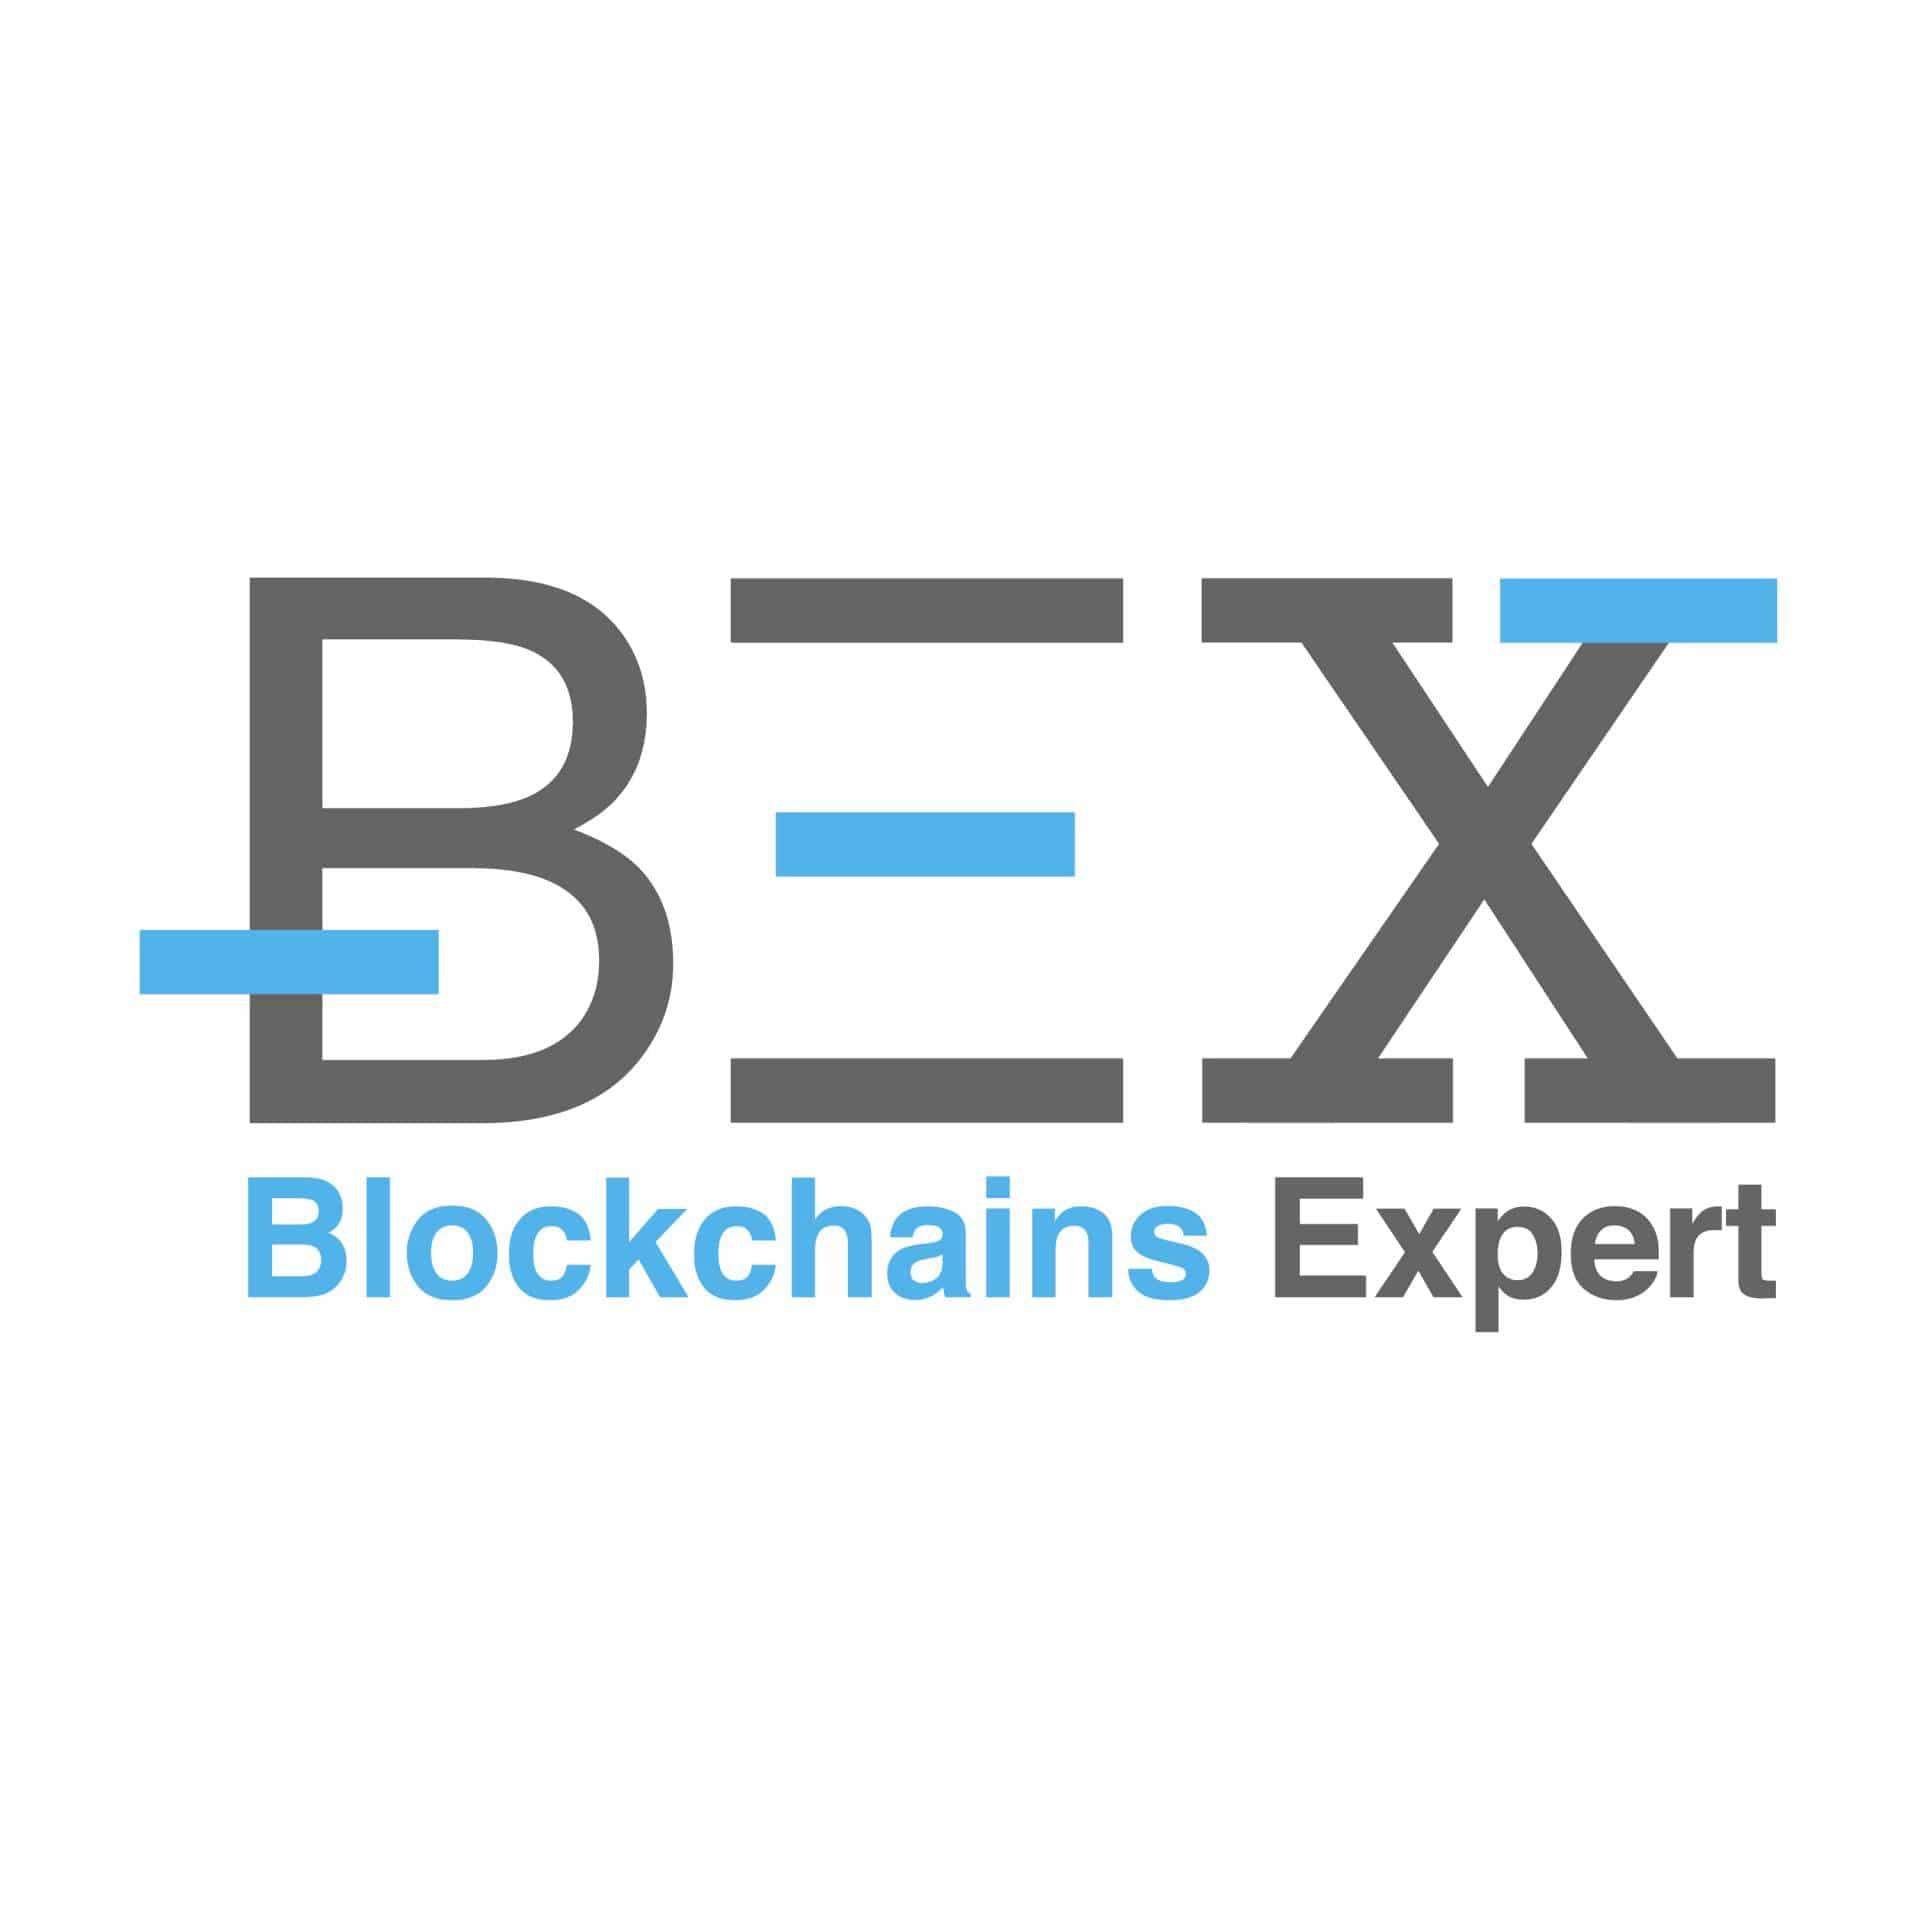 Blockchains Expert